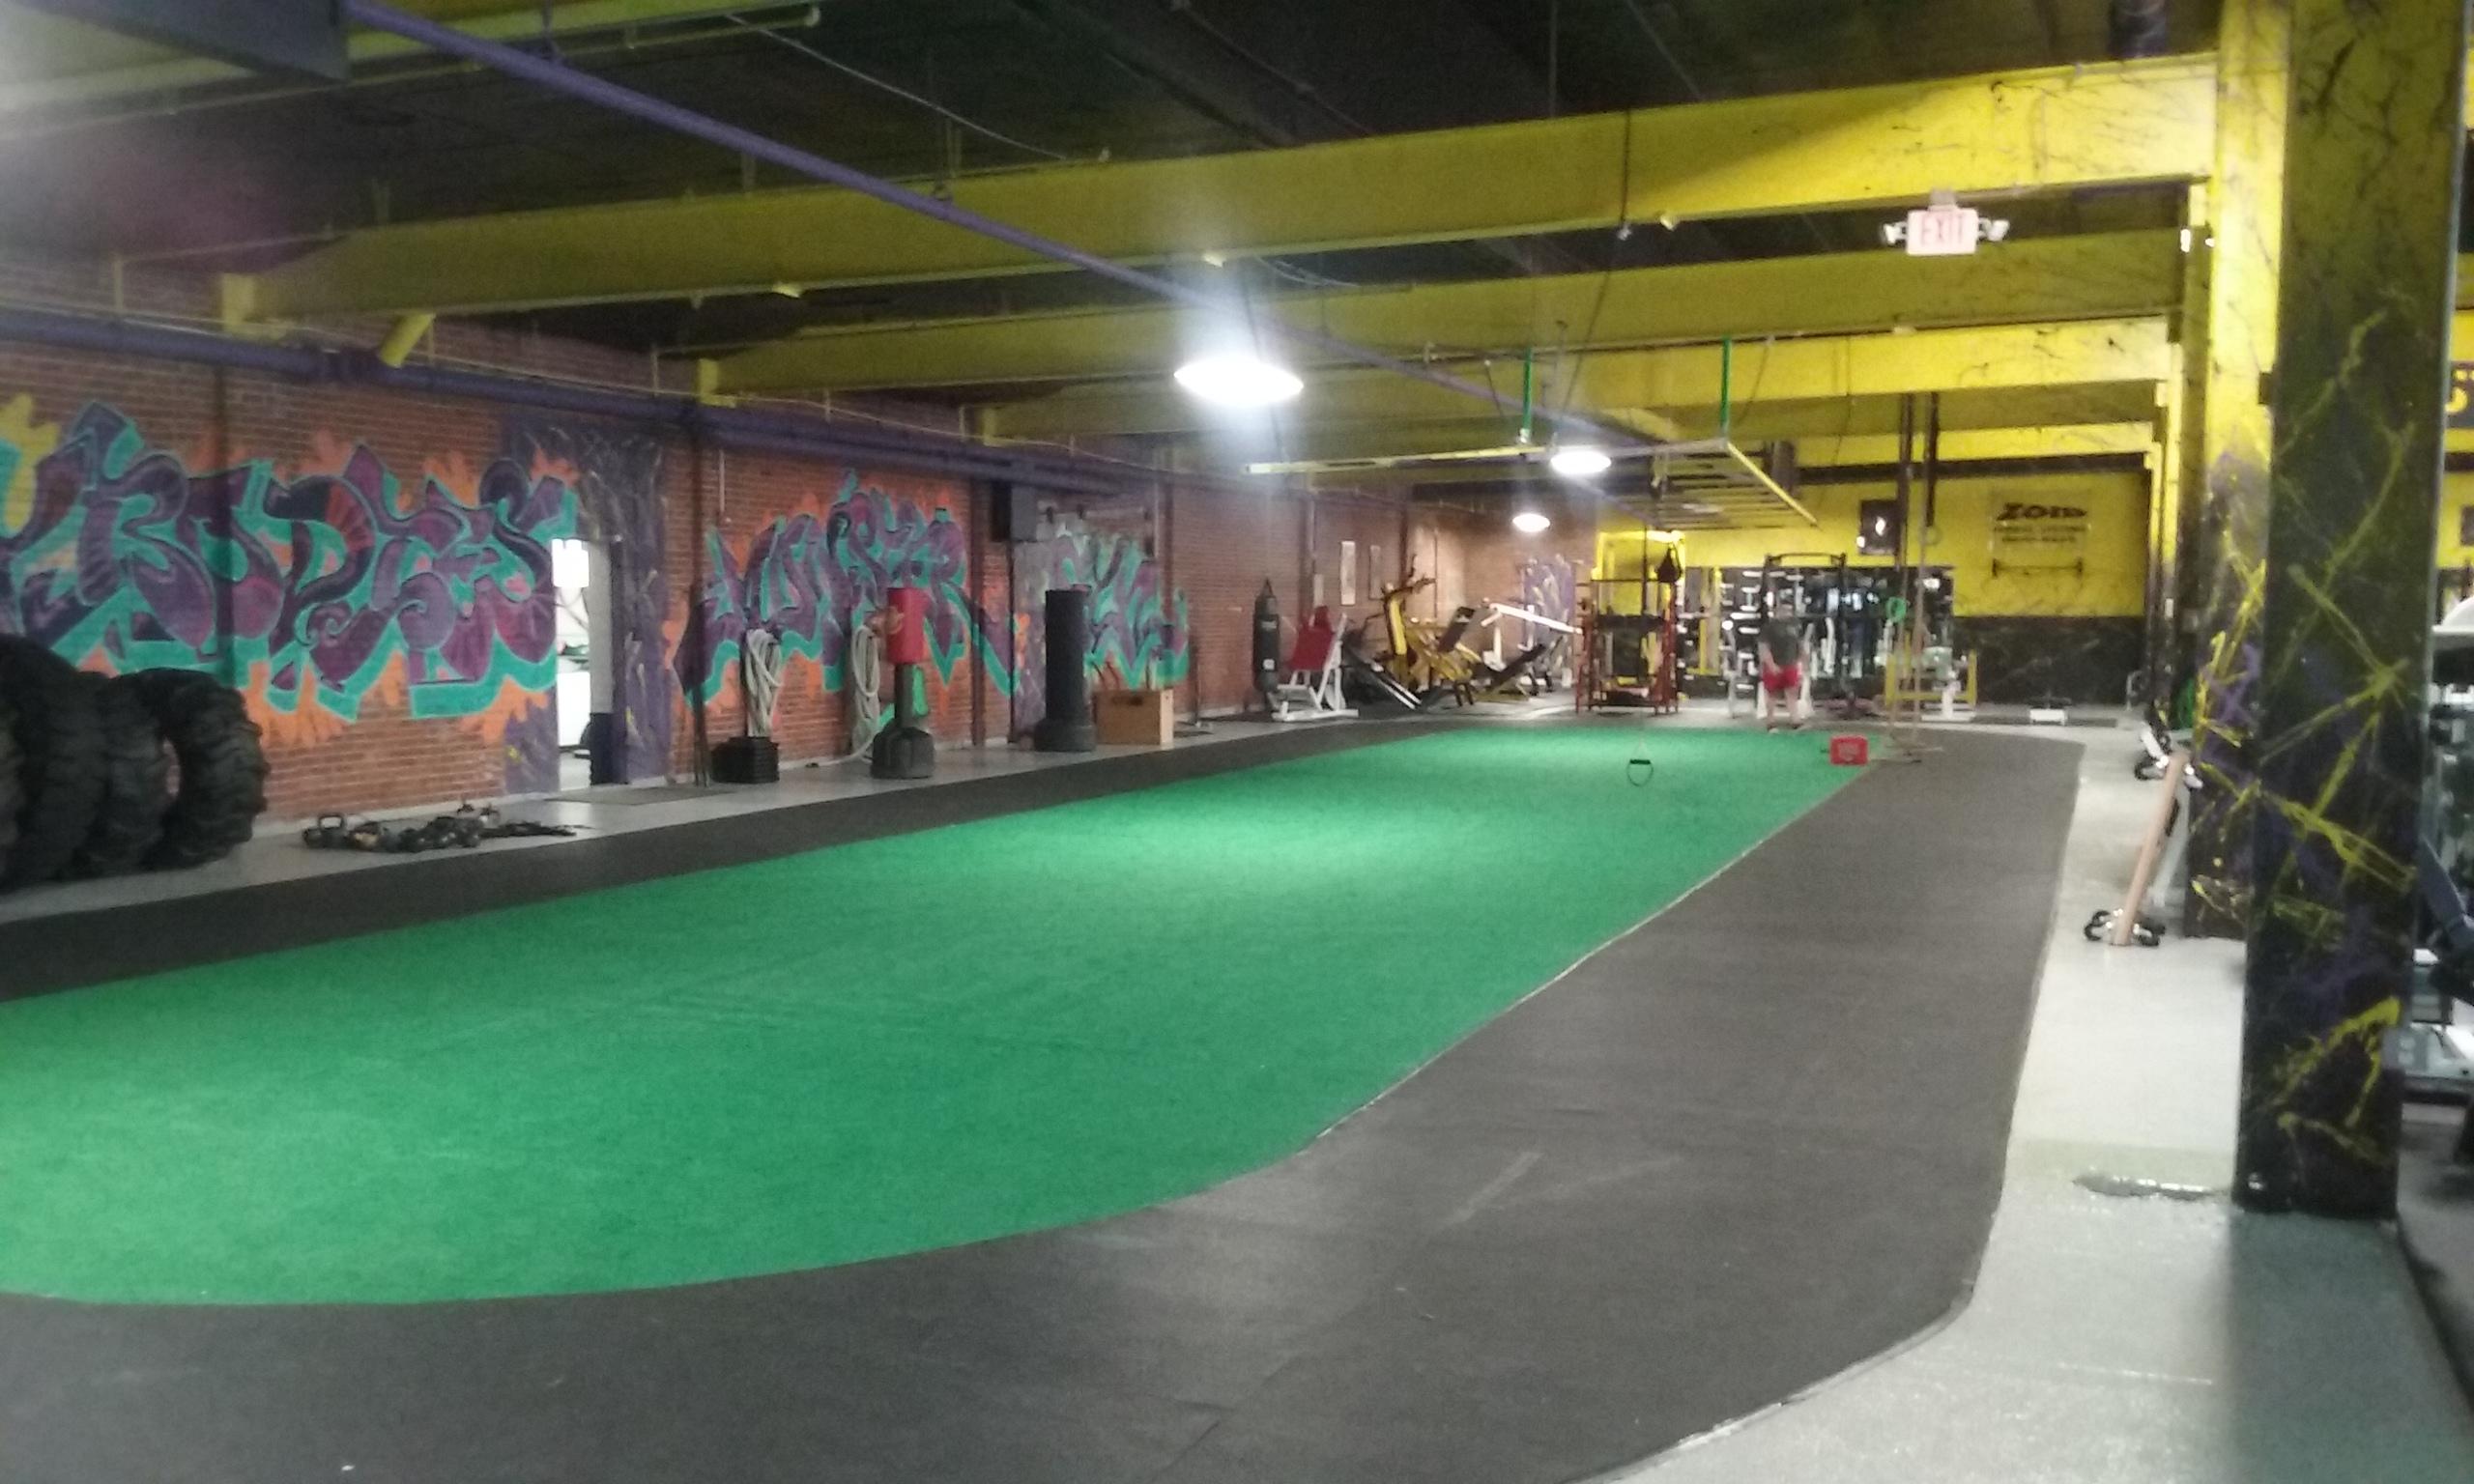 Everybodies Gym image 4